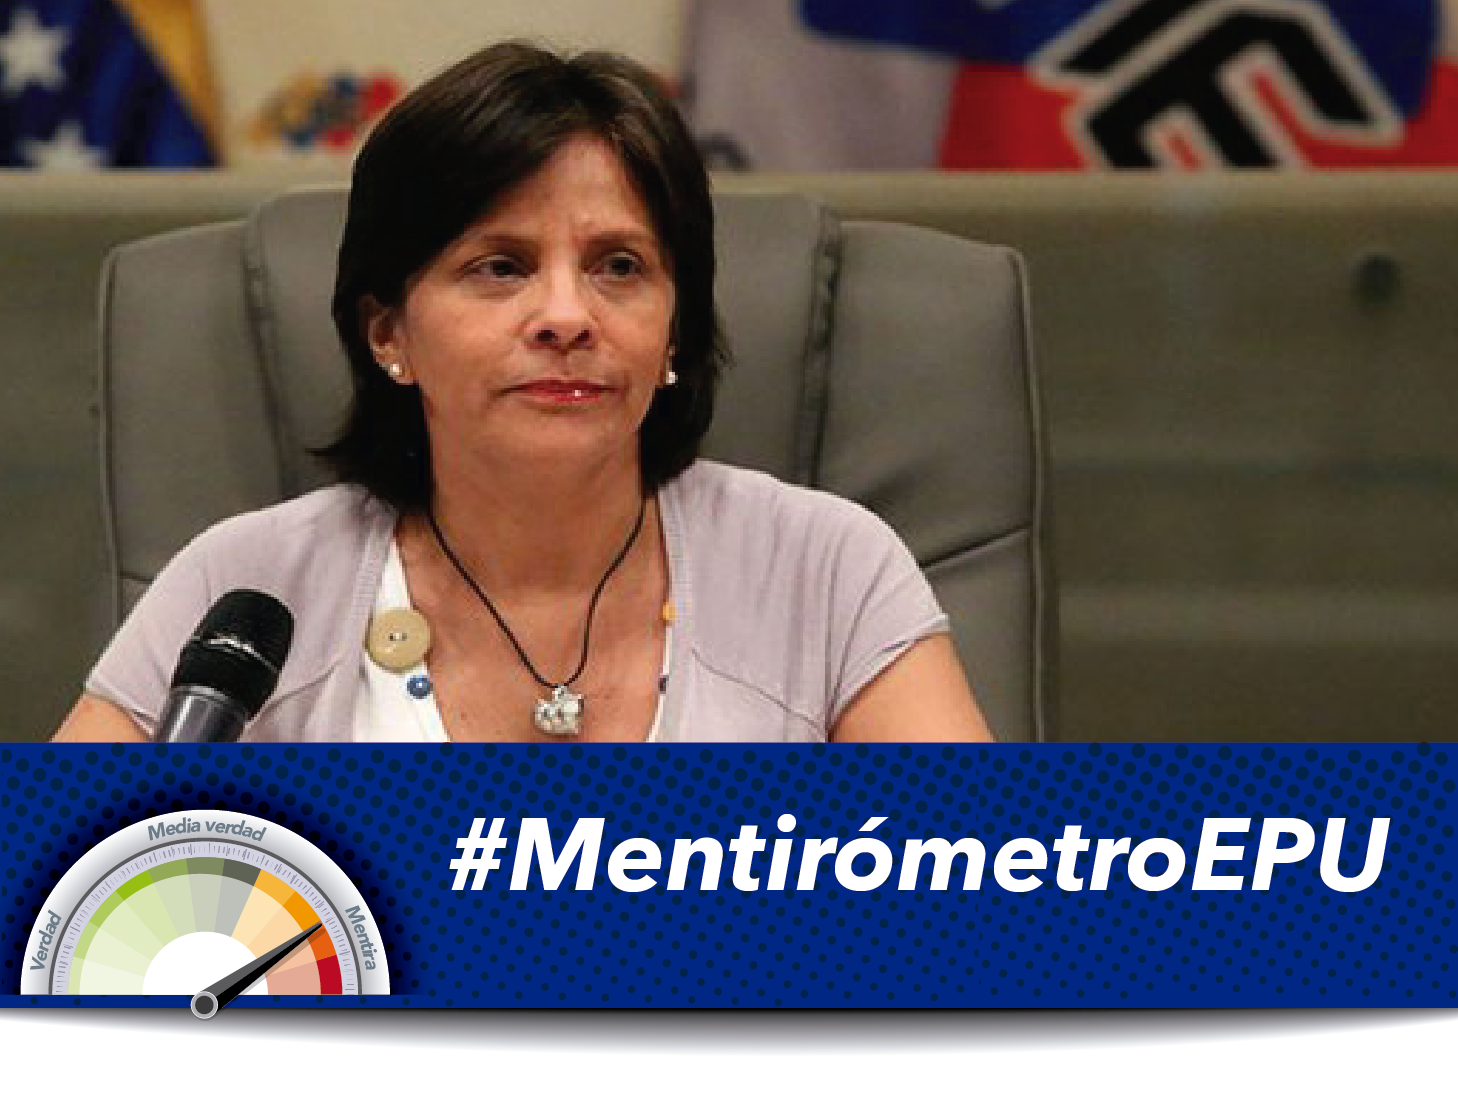 mentirometro_oblitas-01.png